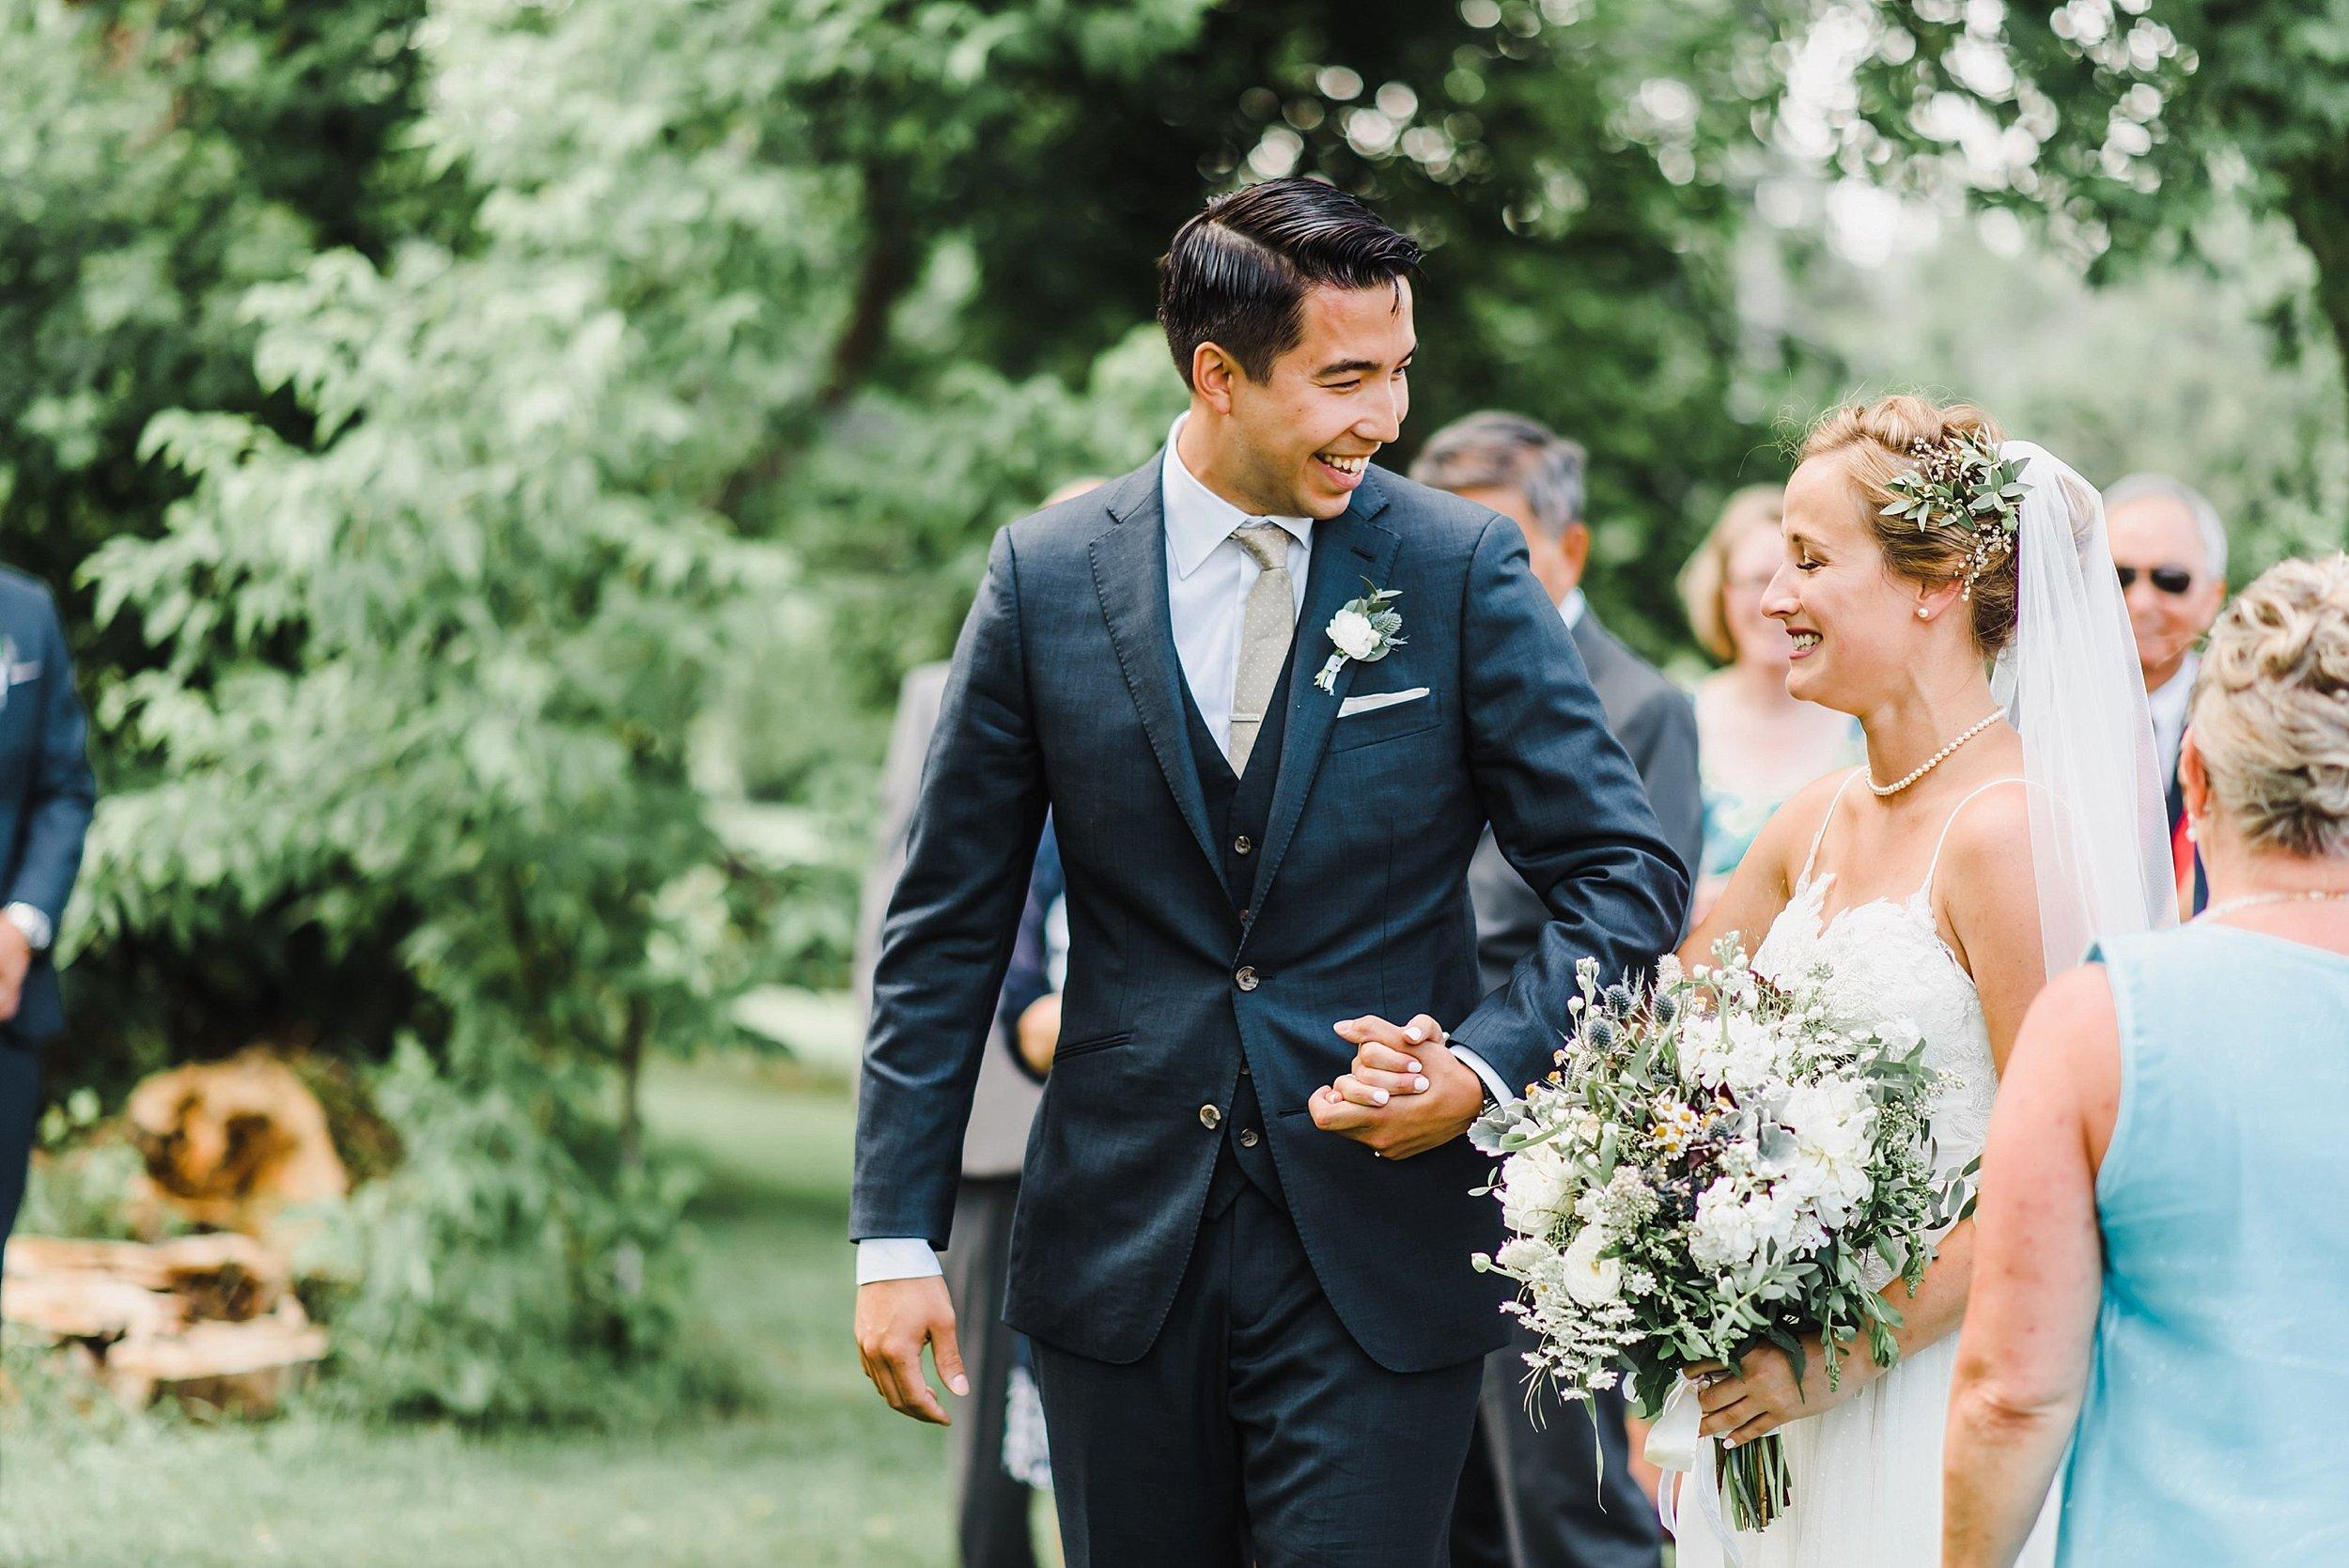 light airy indie fine art ottawa wedding photographer | Ali and Batoul Photography_0810.jpg